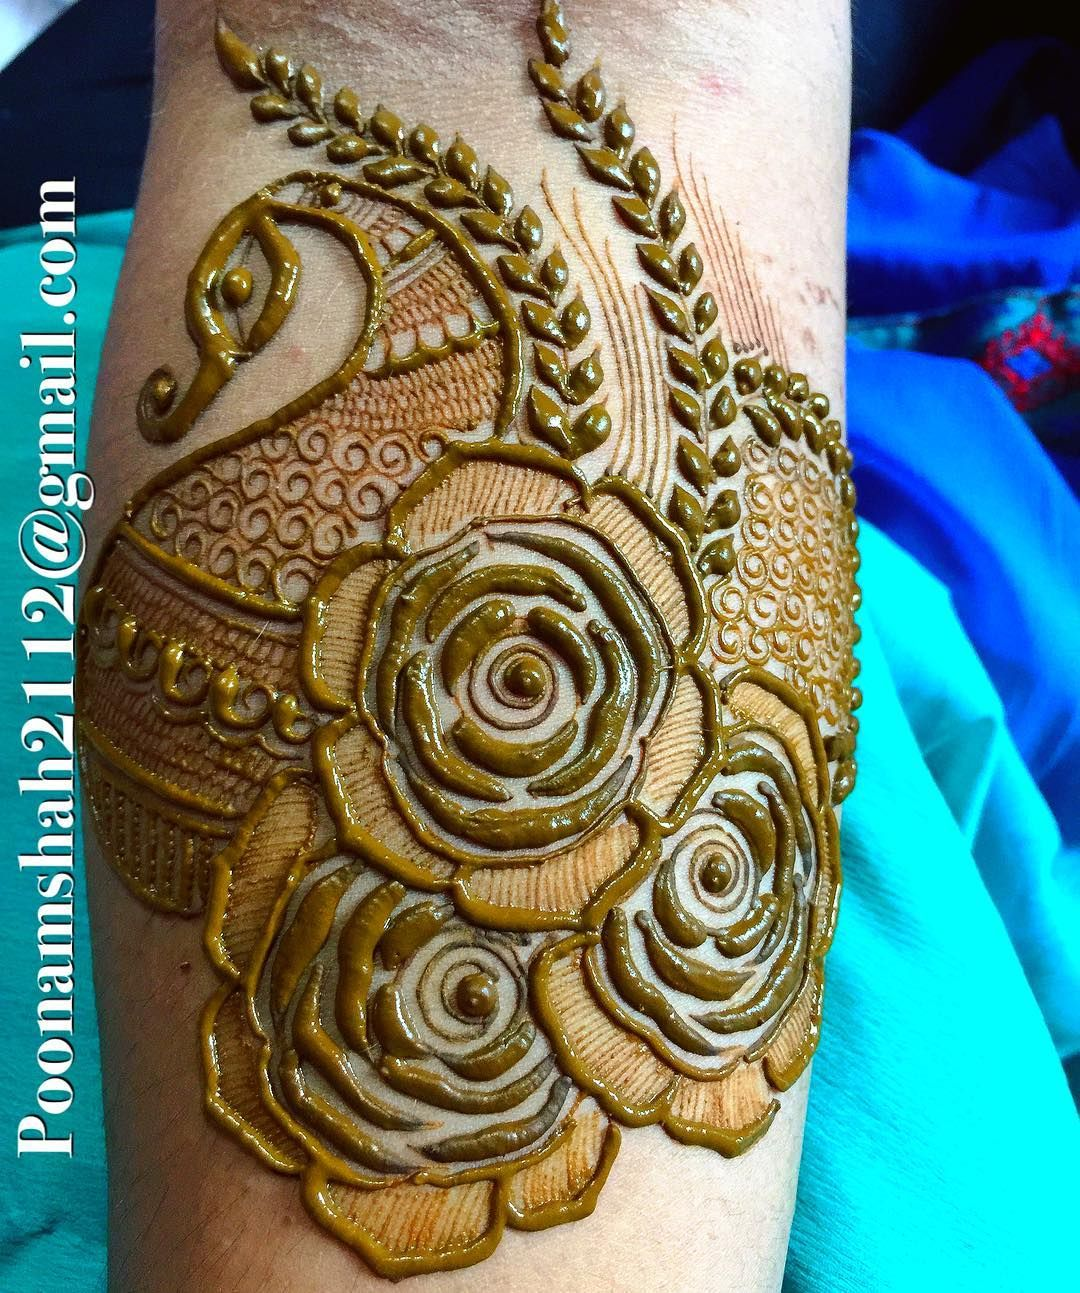 Pin By Sweta Abhay On Mehendi Designs: Henna, Mehndi, Mehndi Designs